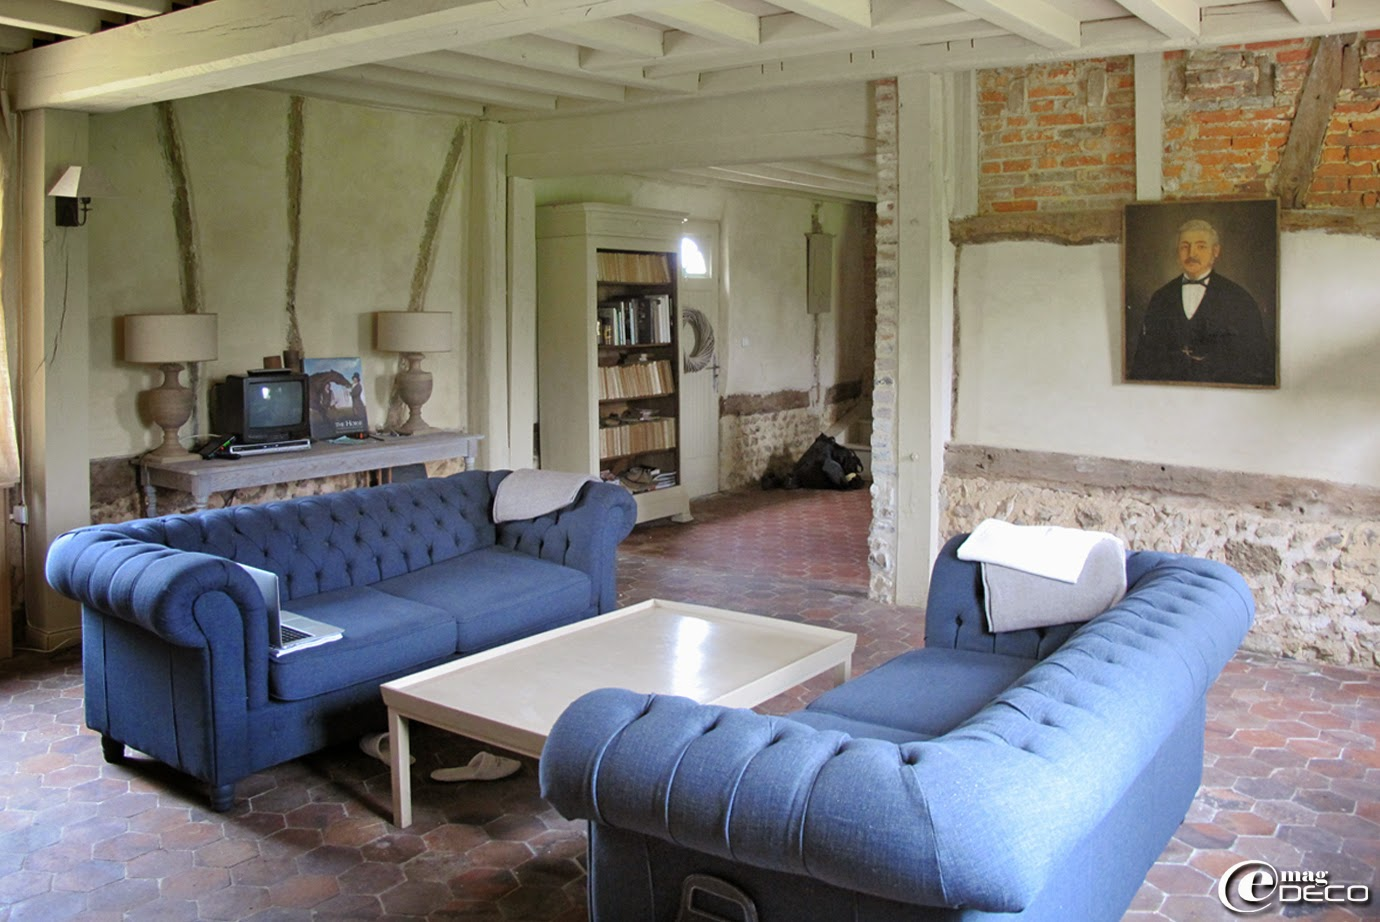 Vente immobilière en Normandie